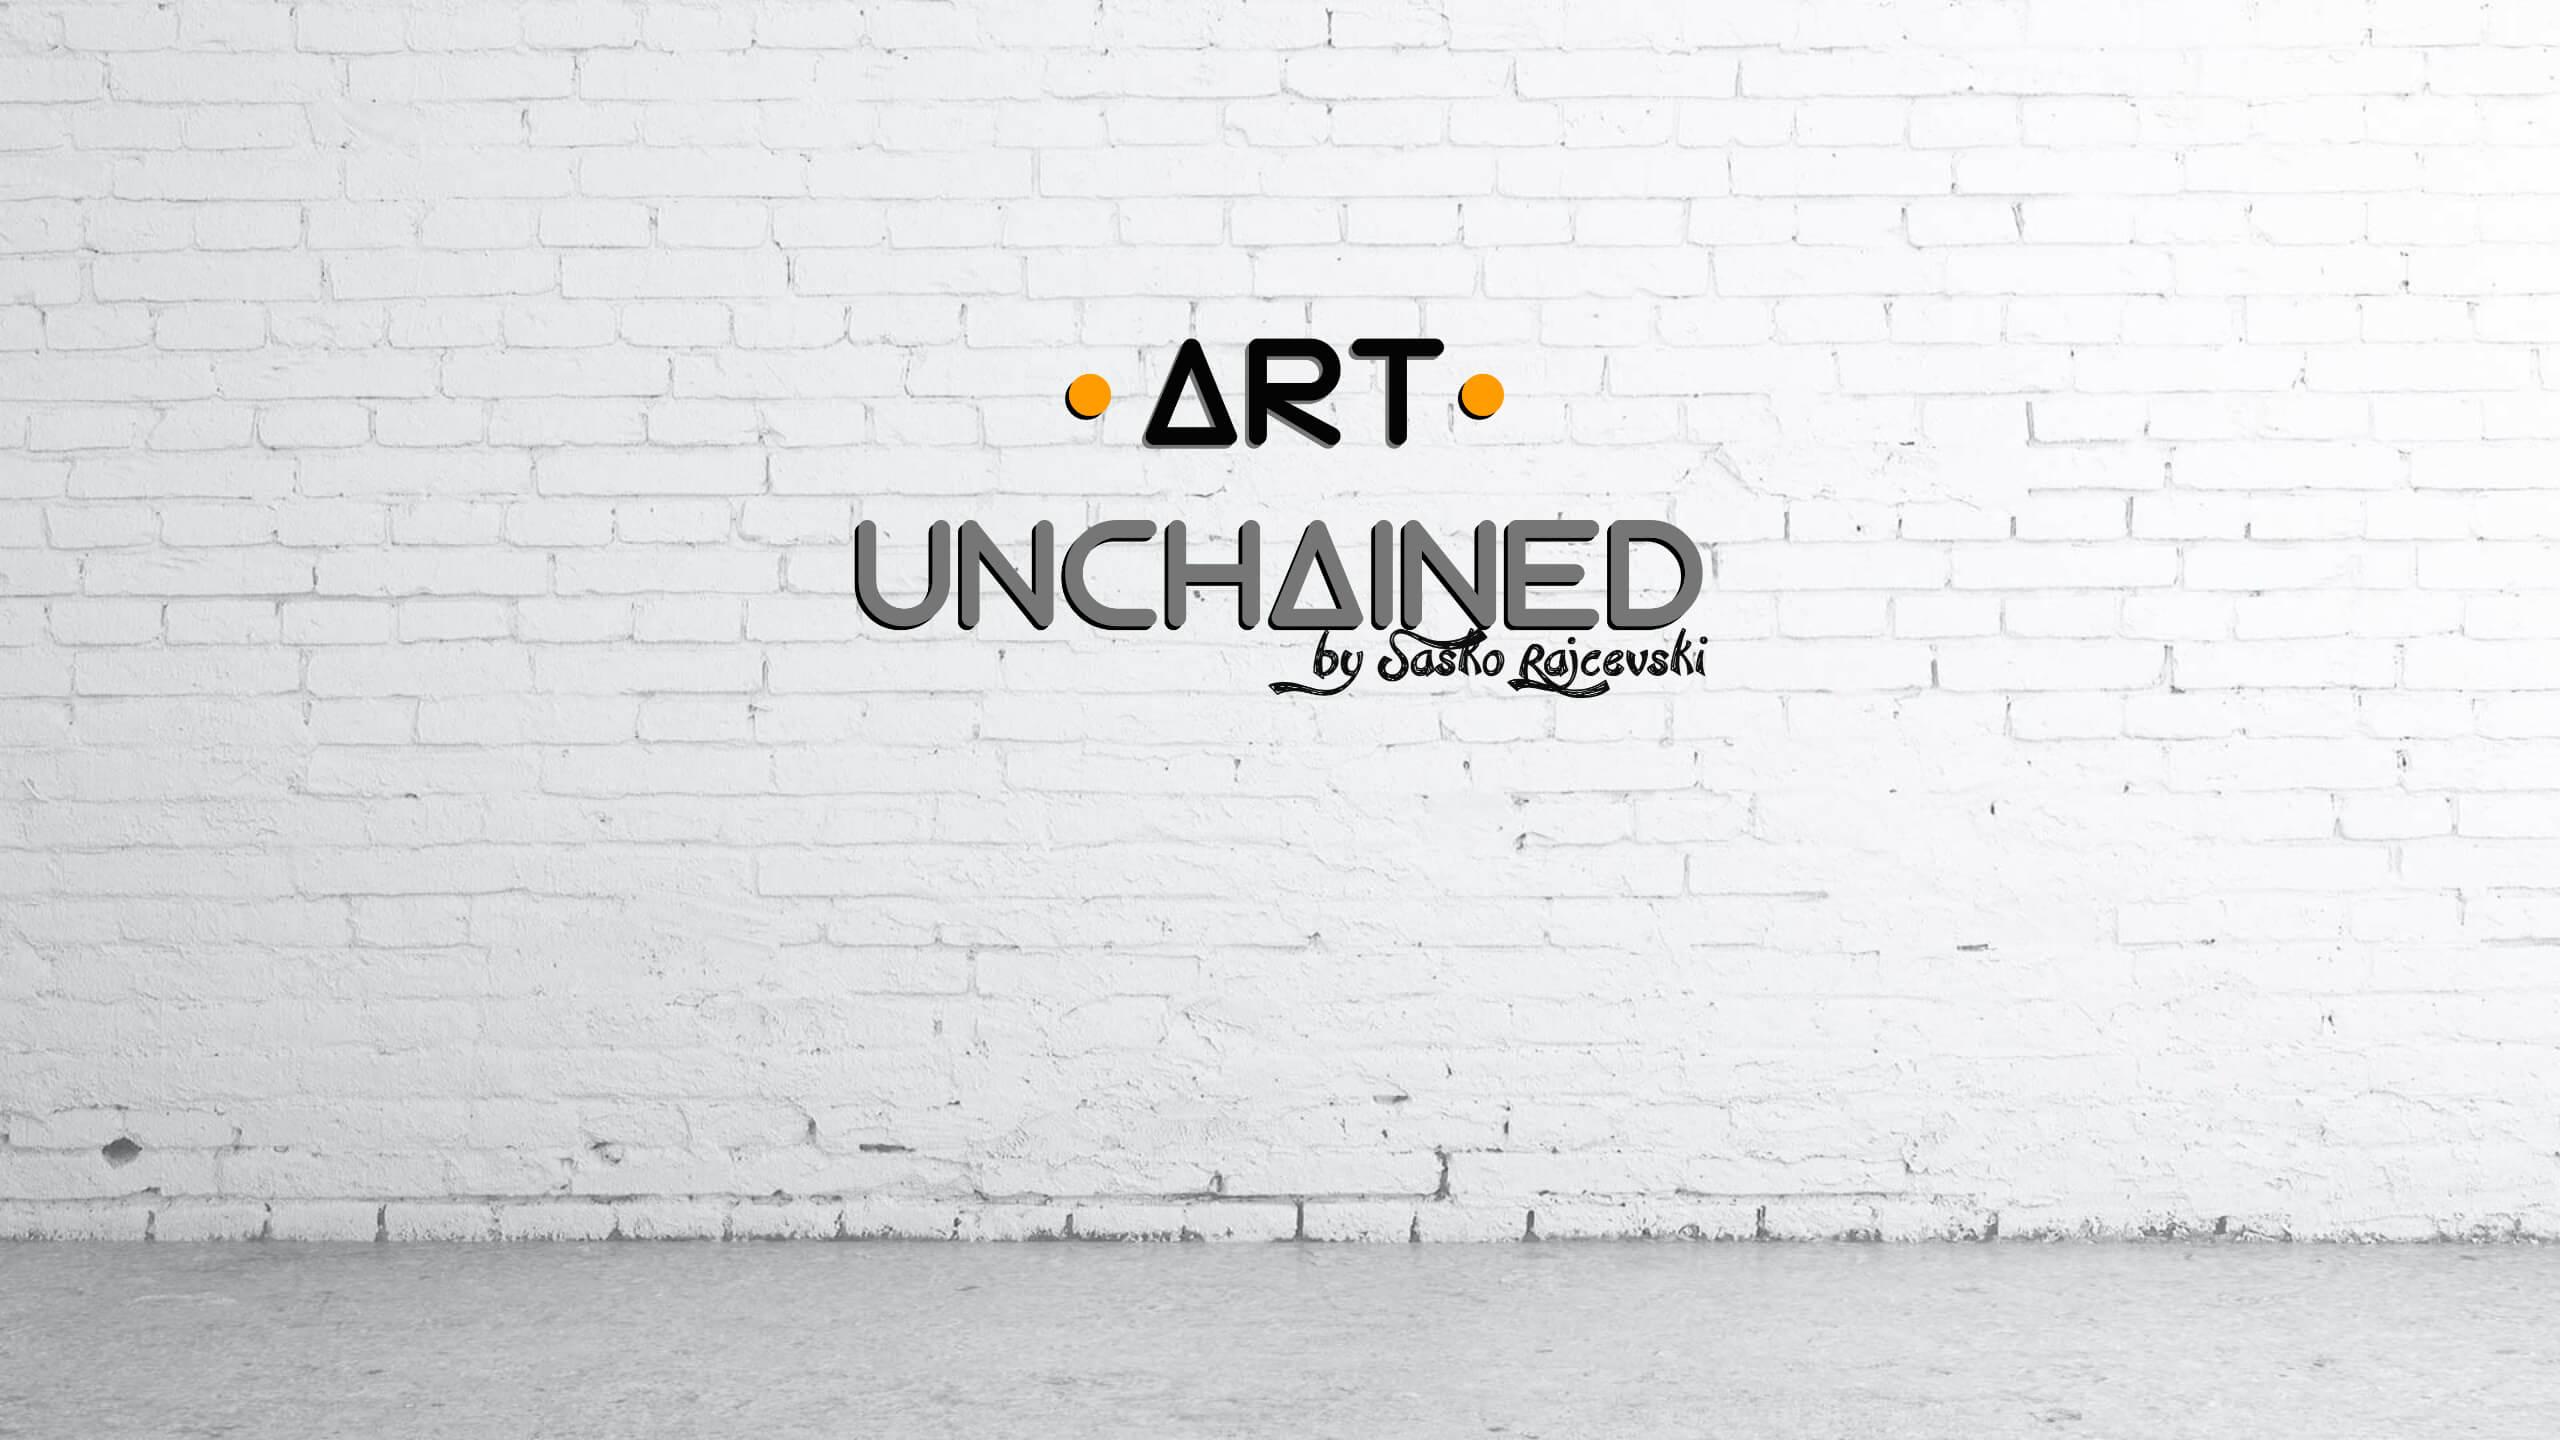 Art Unchained - Entfesselte Kunst by Sasko Rajcevki Homepage